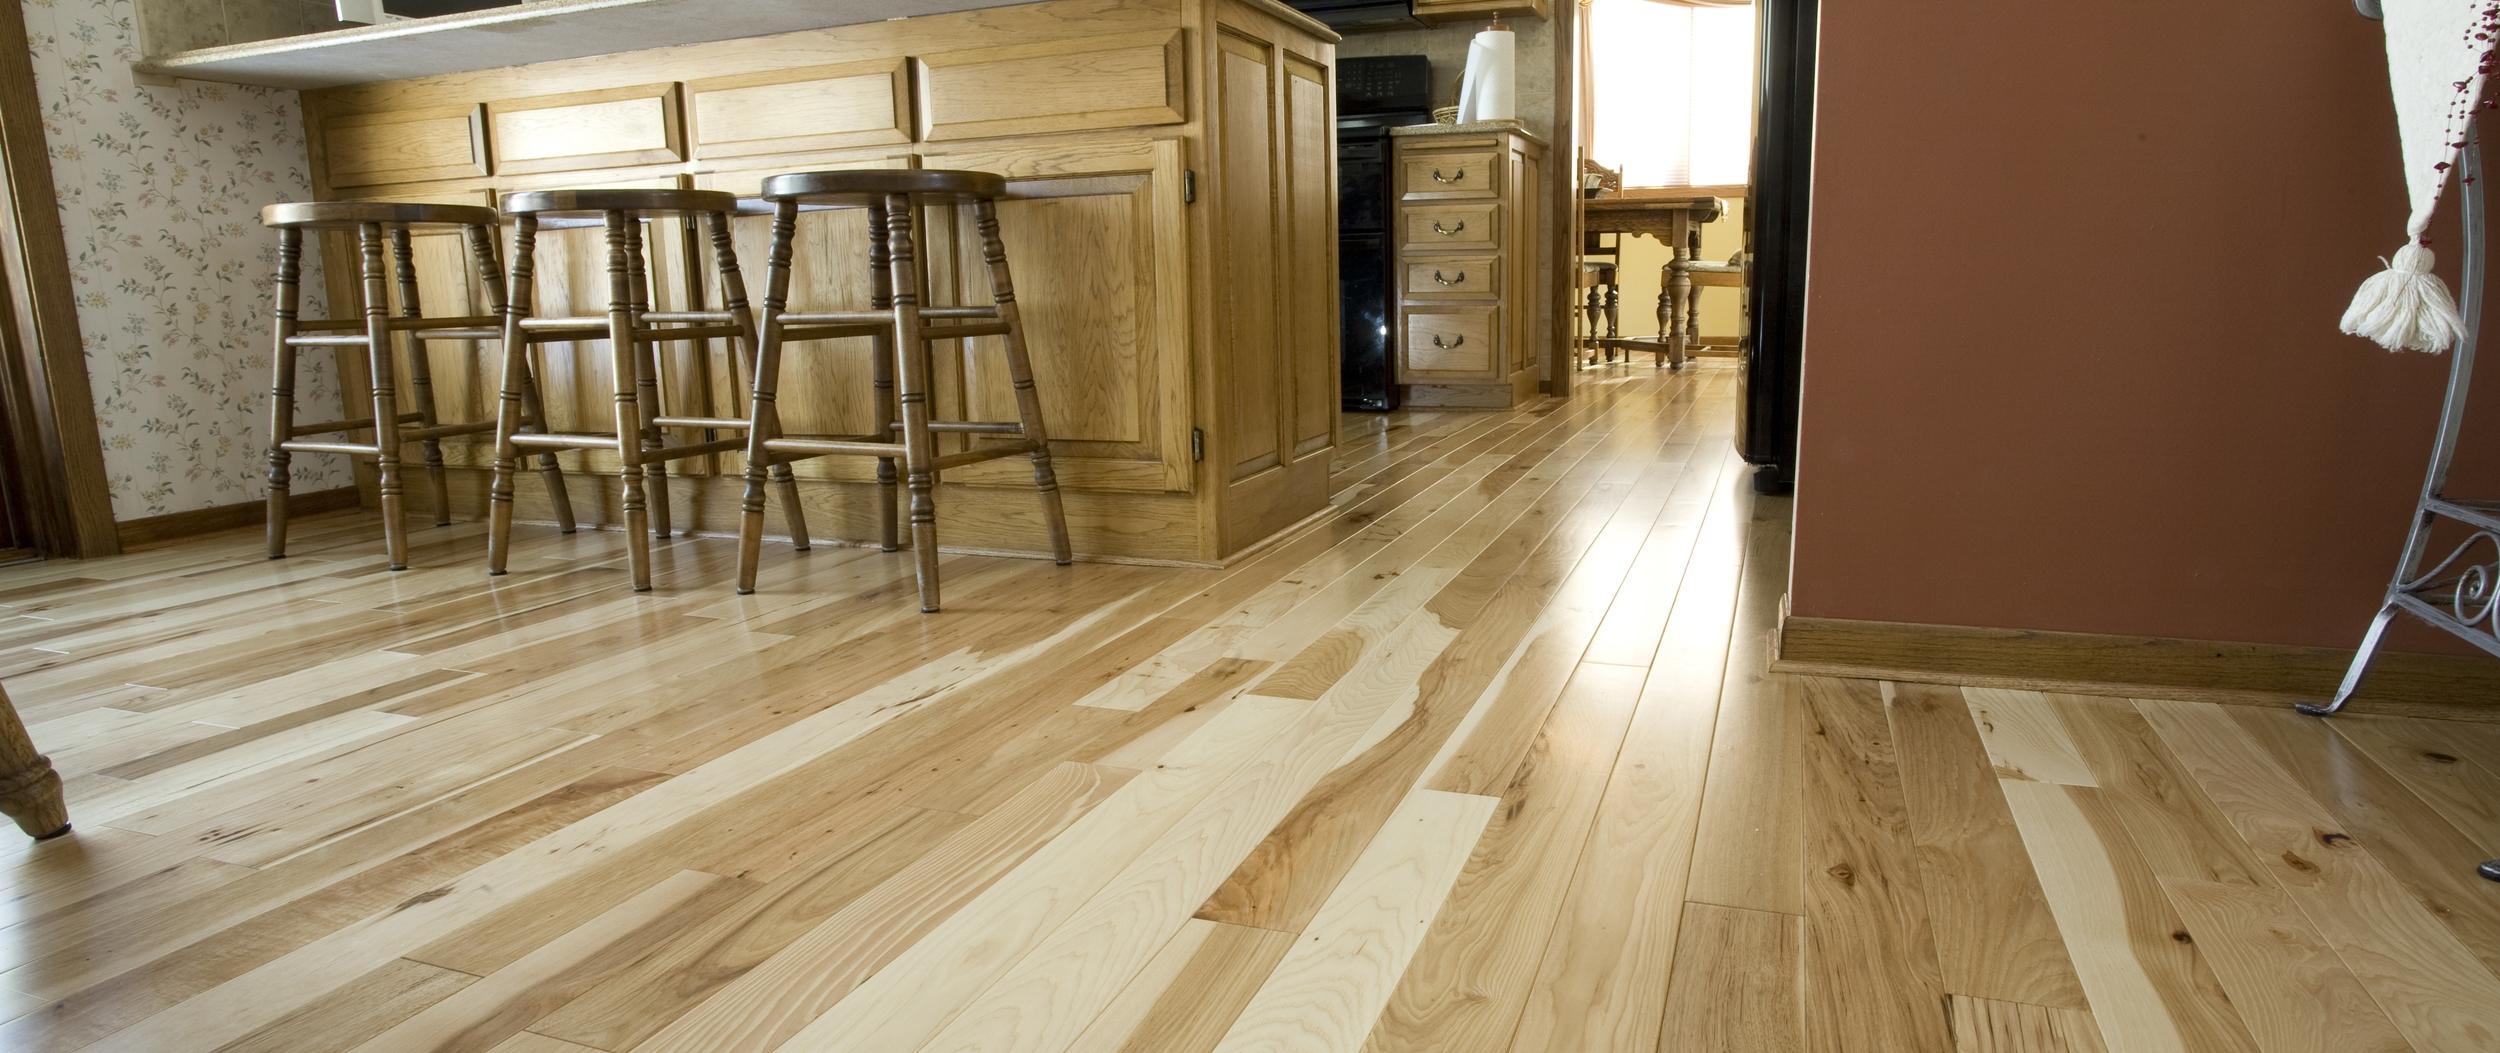 Contact North Wood Flooring